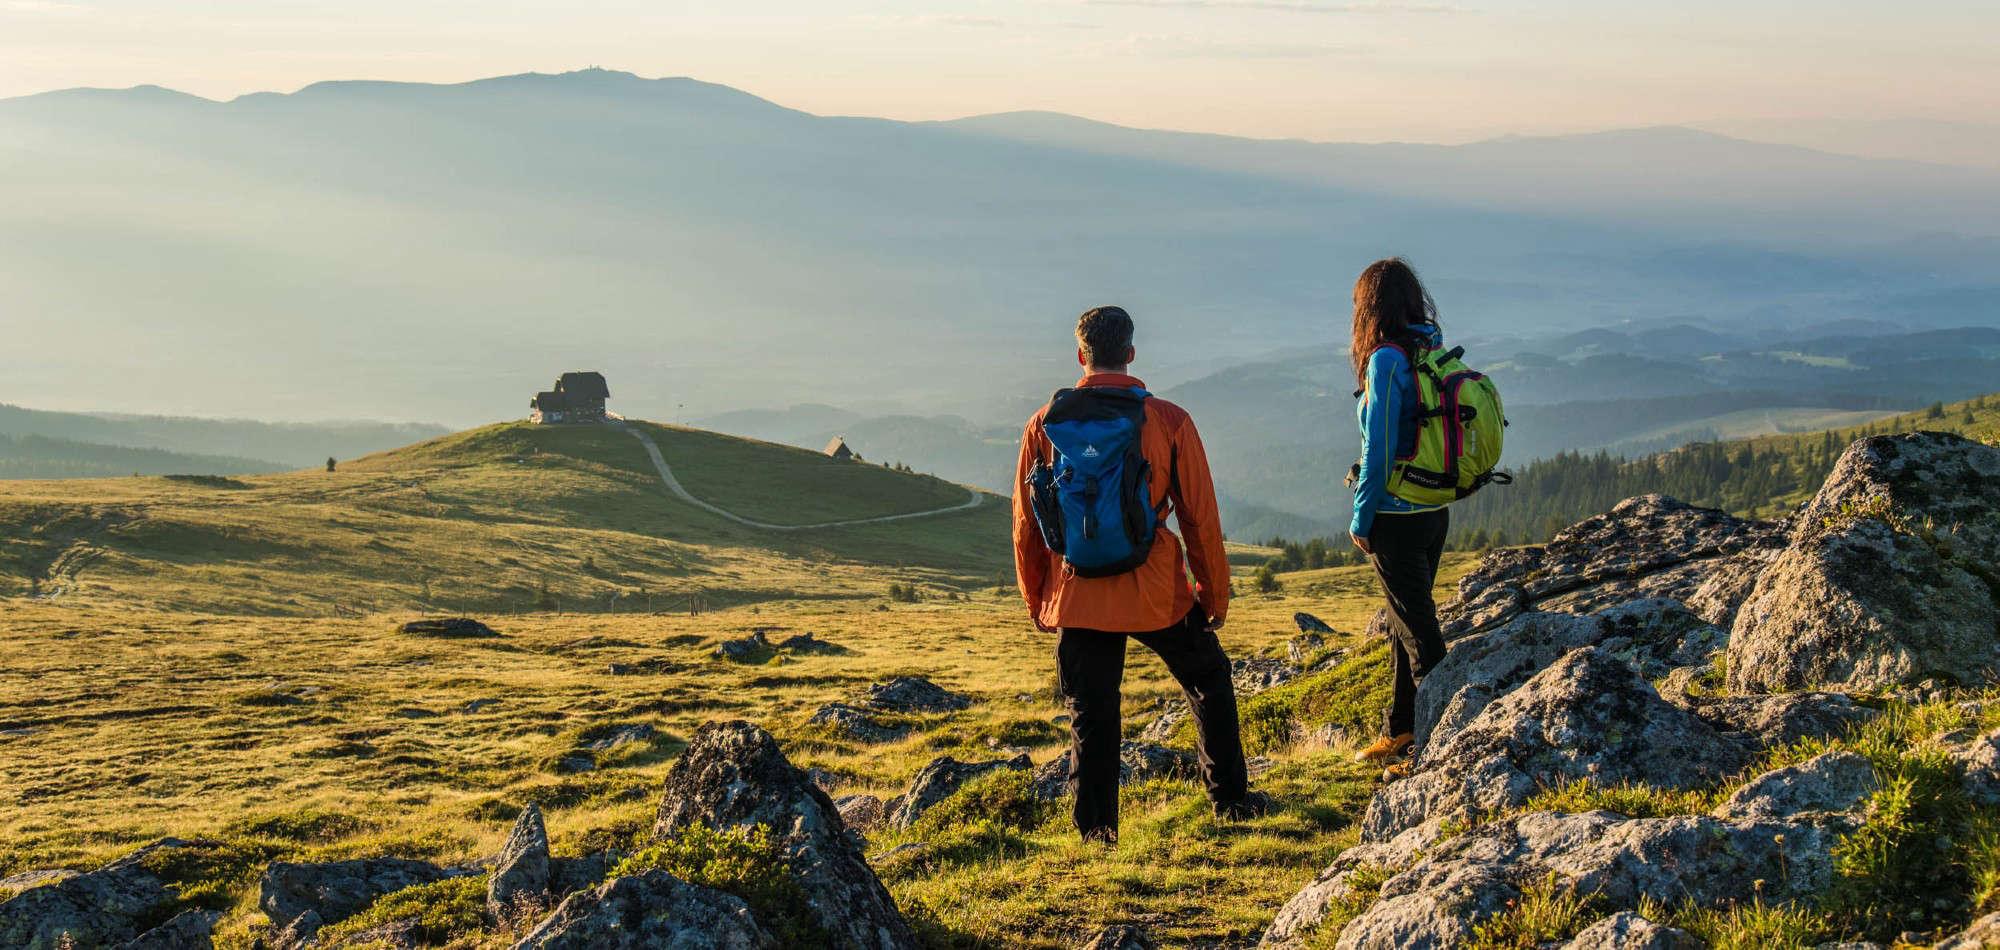 Aller Anfang ist leicht: das Panoramaweg Einsteigerpaket